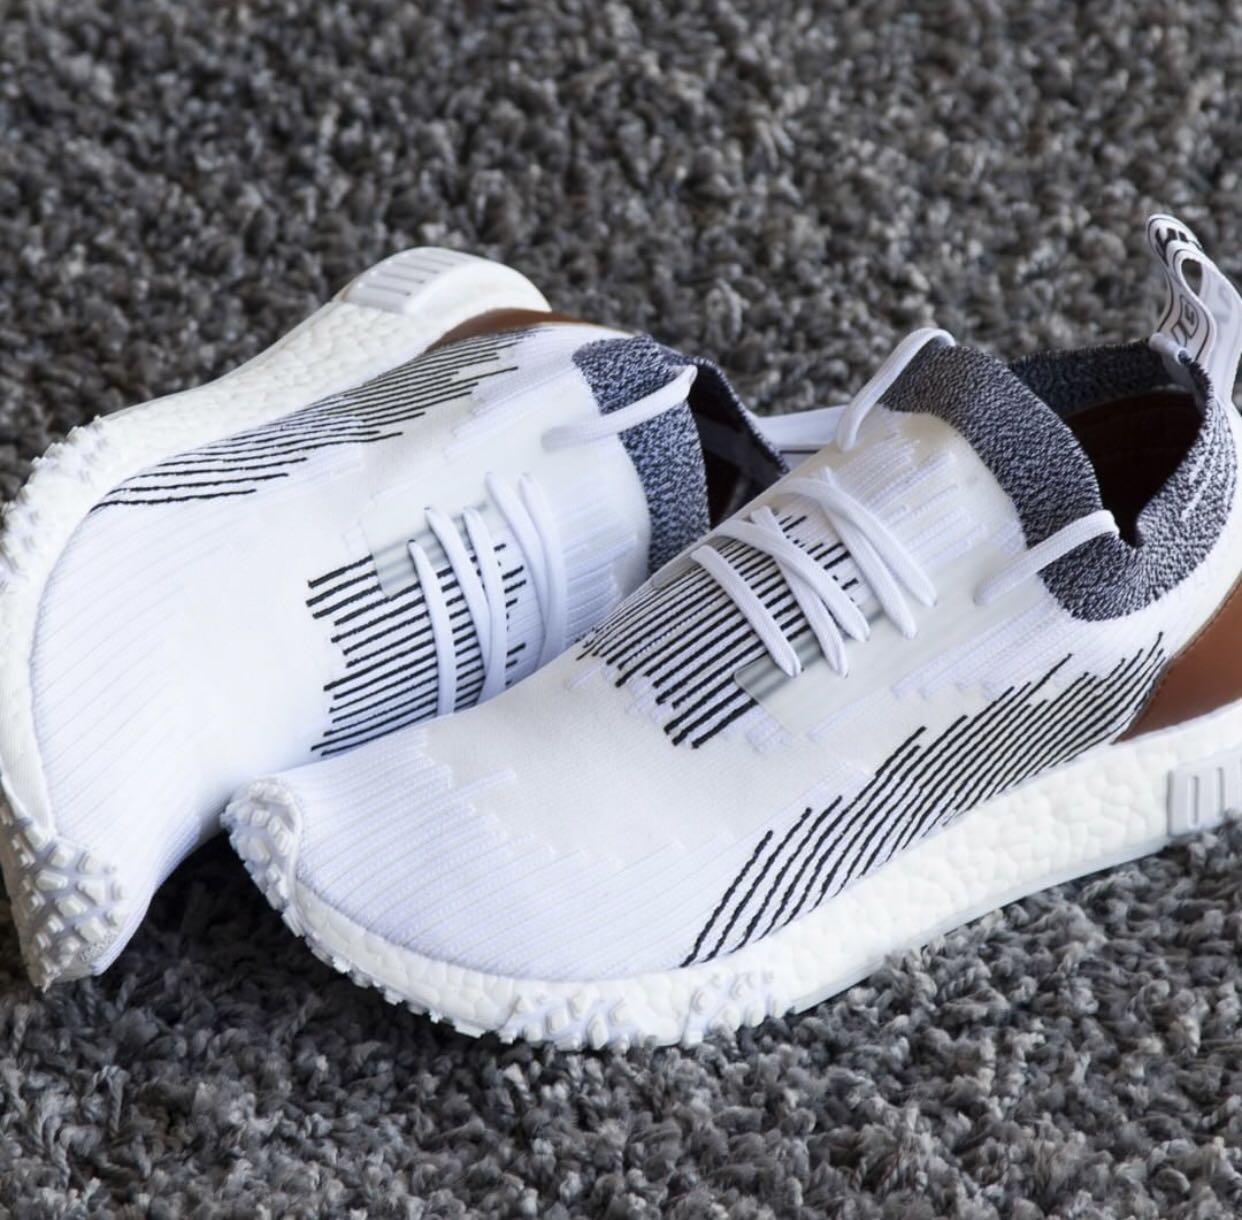 22a8f15b0d1b5 CHEAPER THAN RETAIL 🔥 Adidas NMD R2 Racer Monaco White Leather Primeknit  Shoe